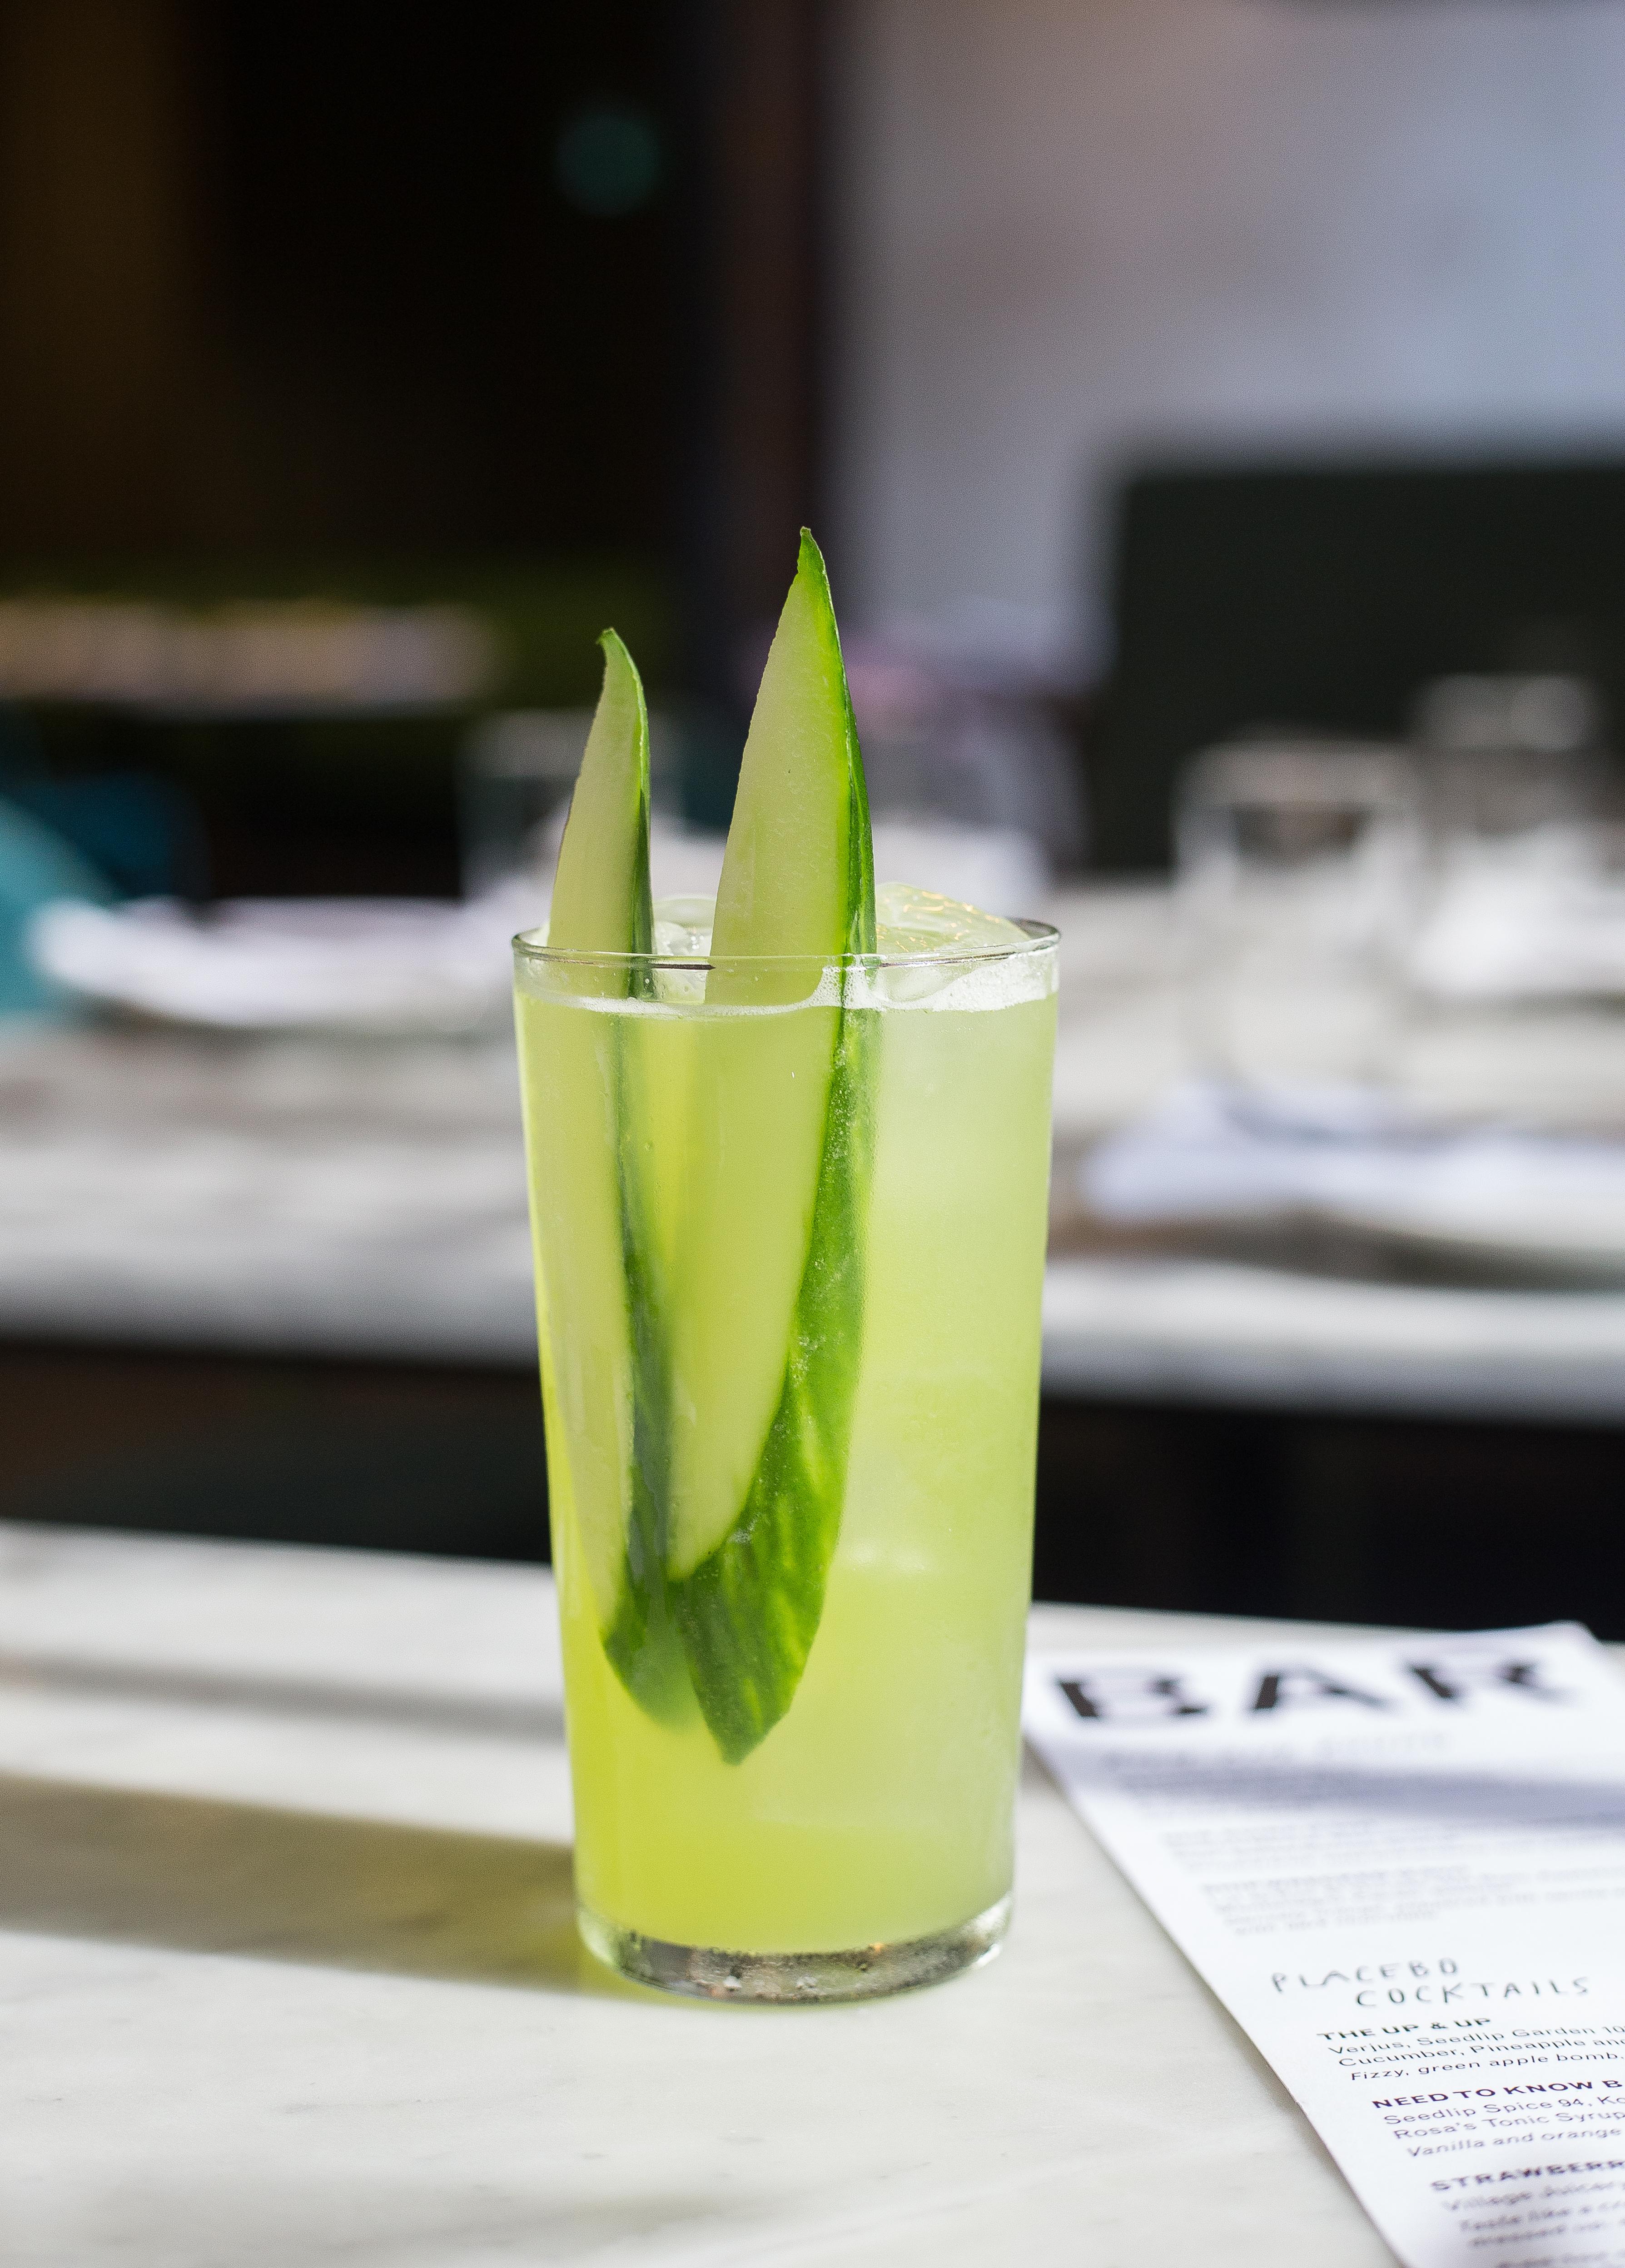 The Up & Up cocktail at Rosalinda restaurant